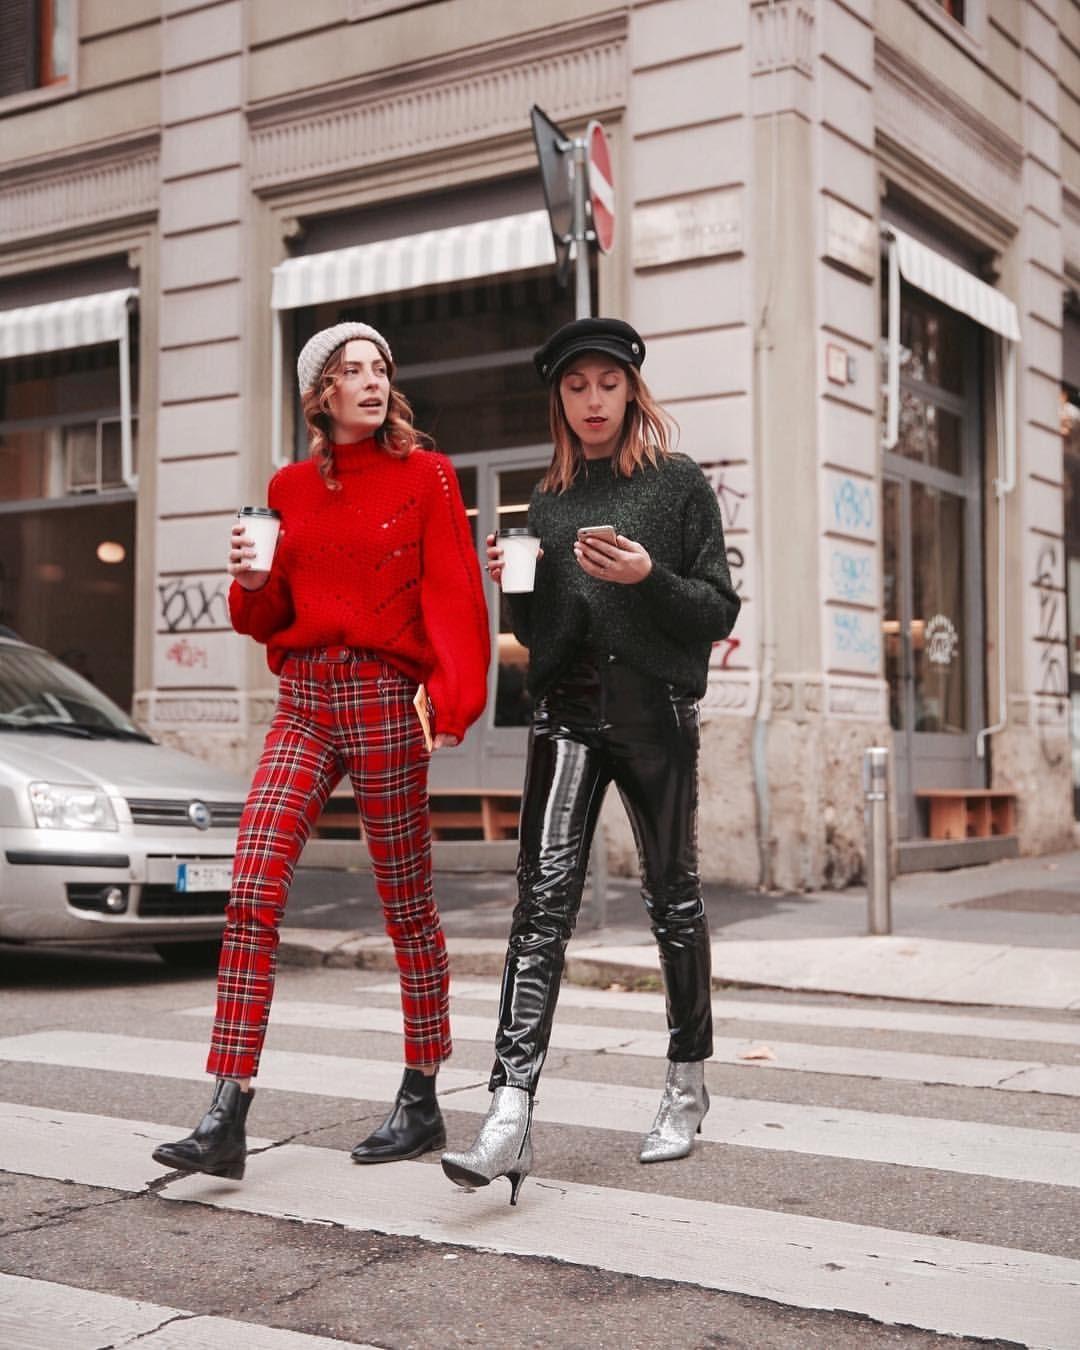 Awesome European Street Style